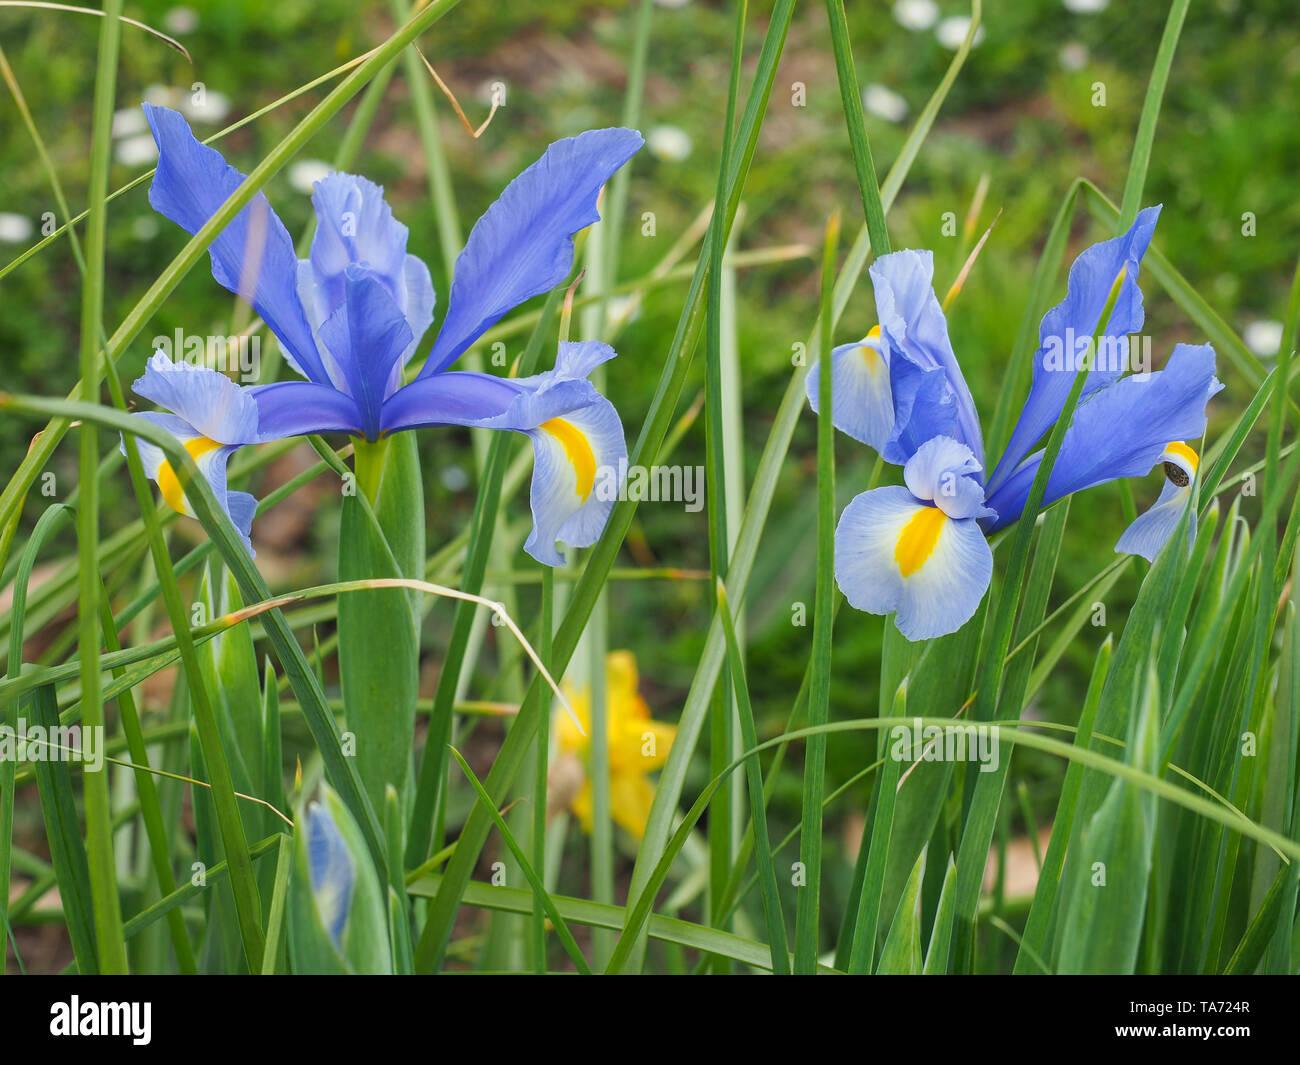 Picture Of Iris Flowers Stockfotos & Picture Of Iris Flowers Bilder ...